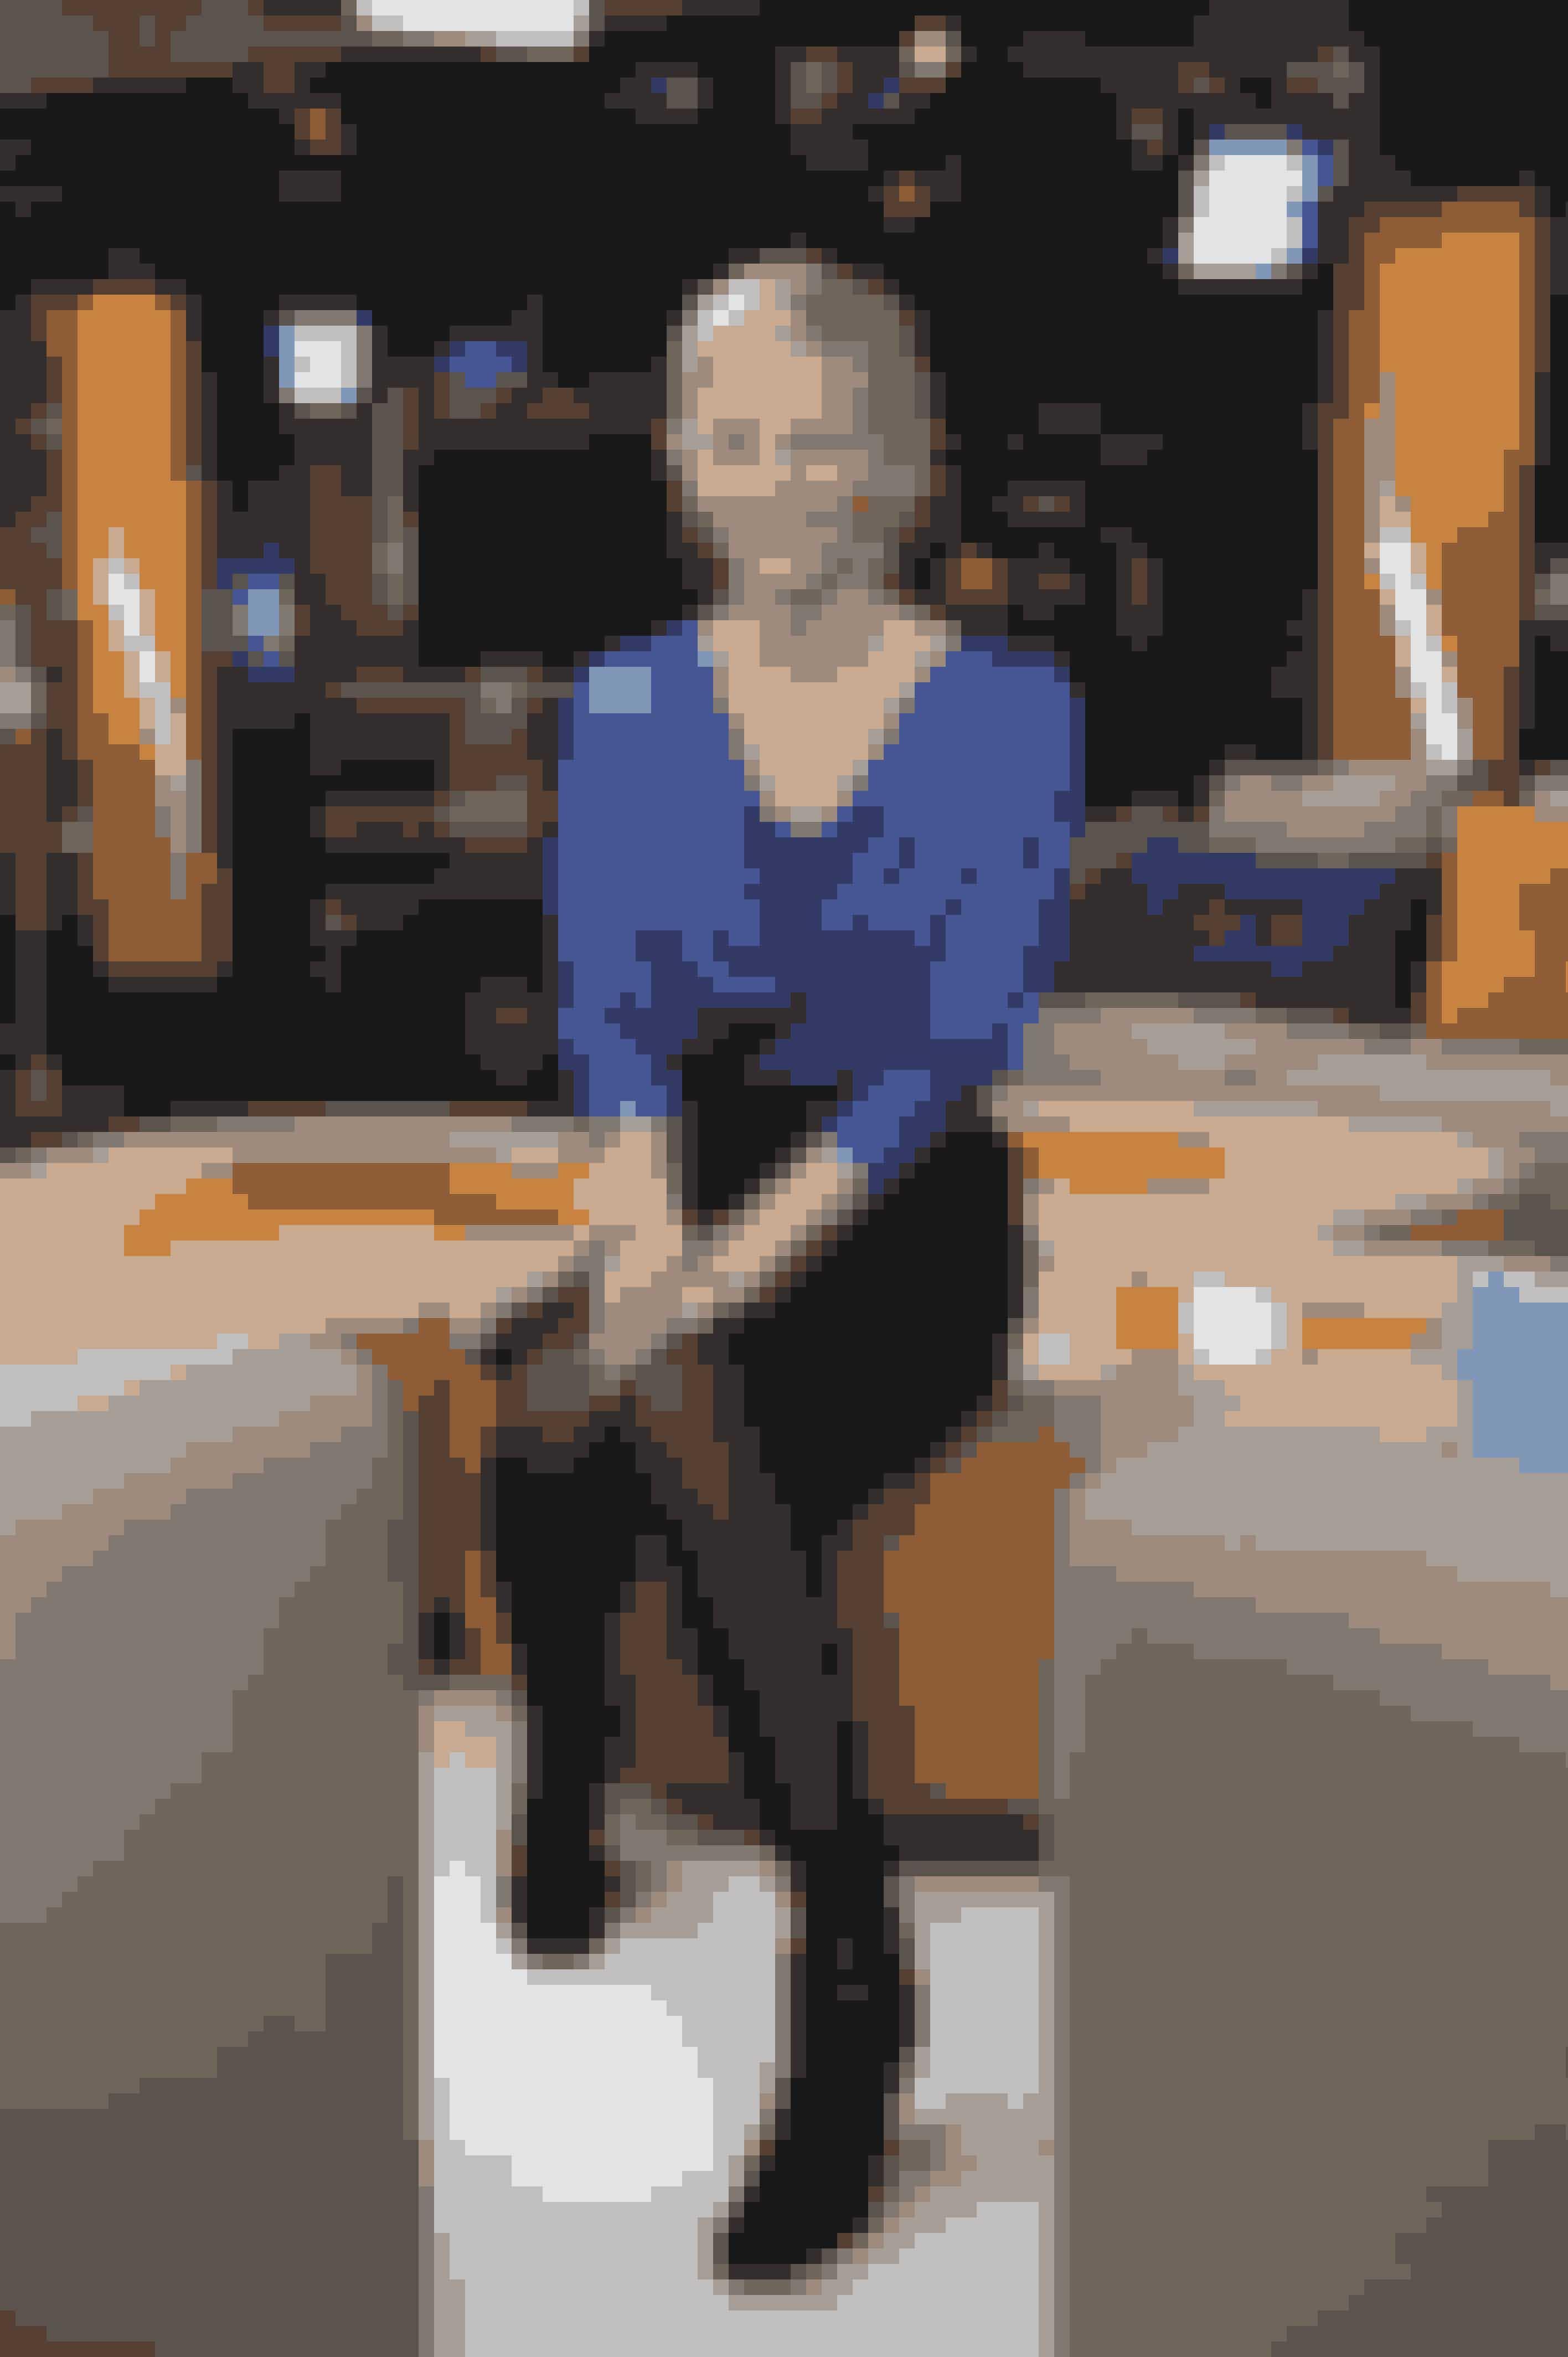 Tv-vært Louise Wolff  tilbage i 2010, da Aftenshowet fik nyt studie og nye værter.